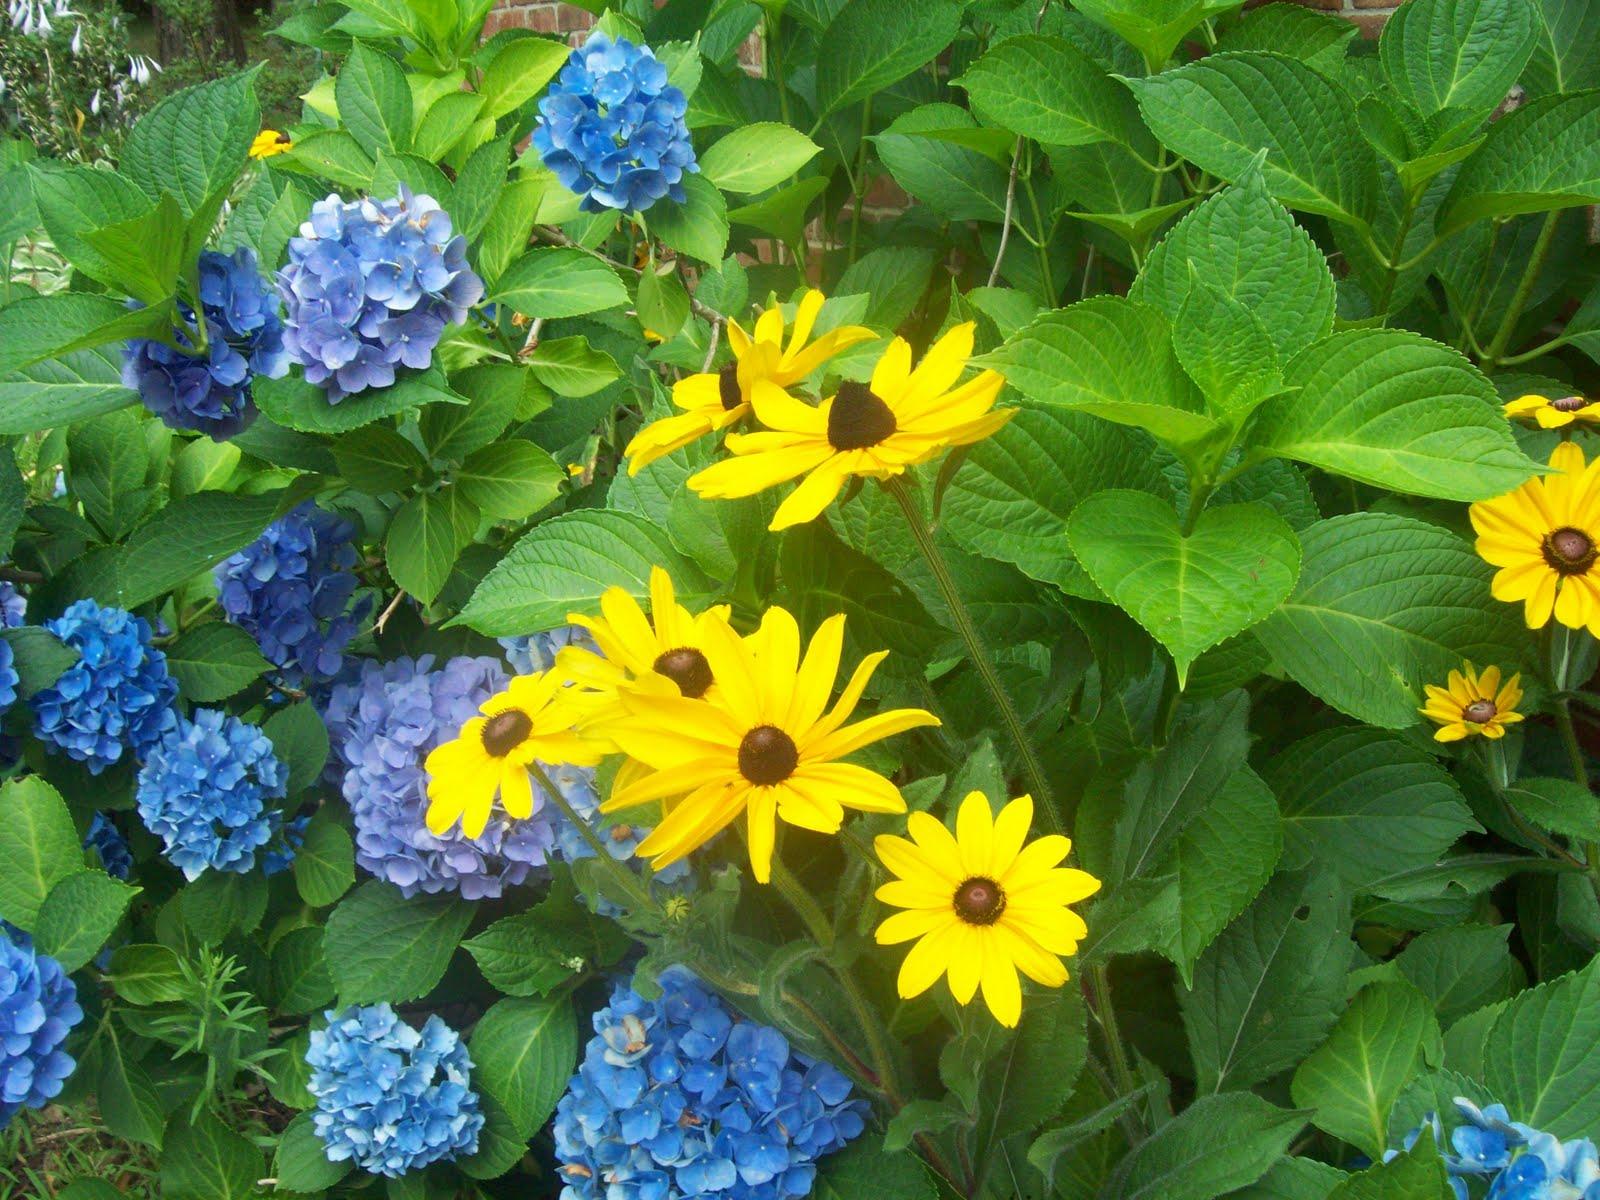 this morning s garden shot